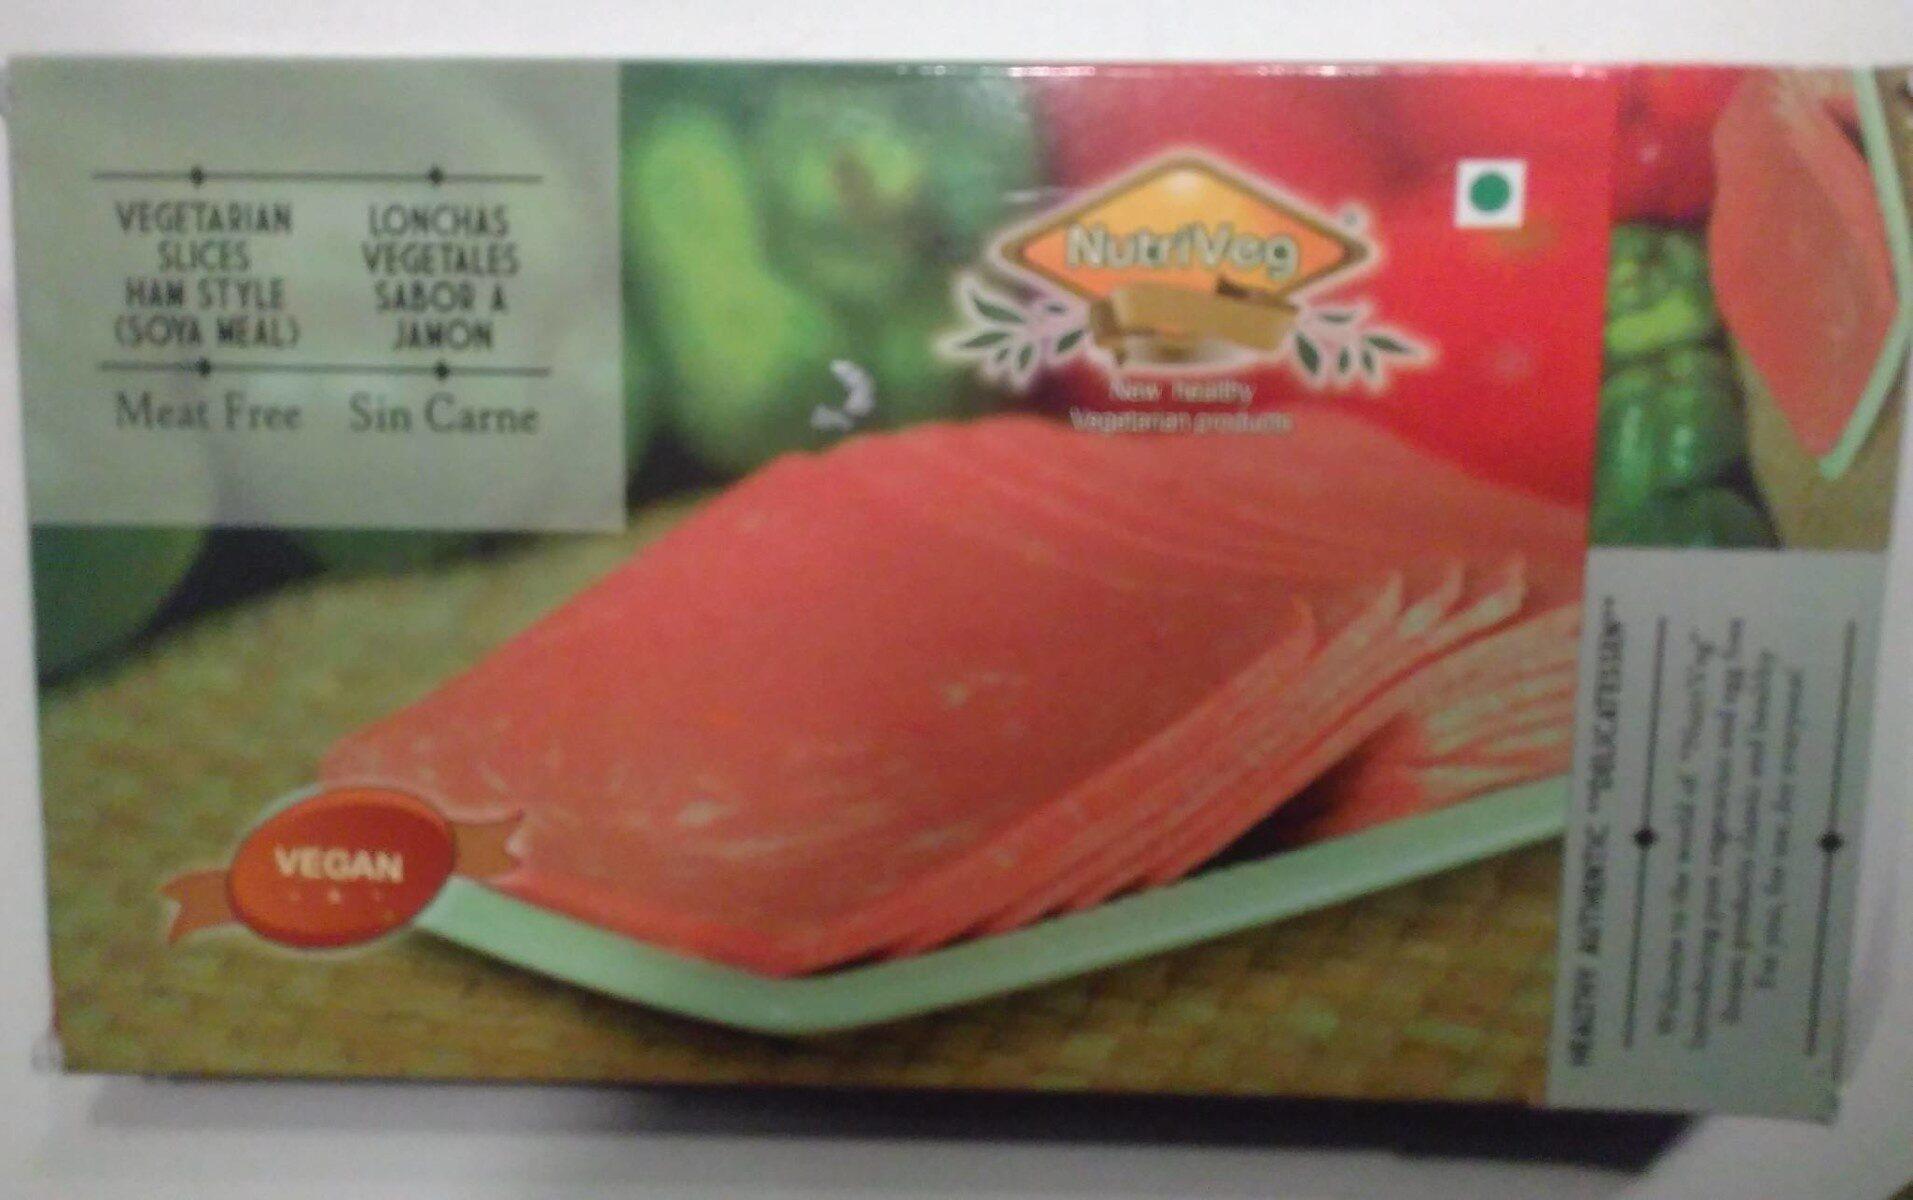 Lonchas vegetales sabor a Jamón - Product